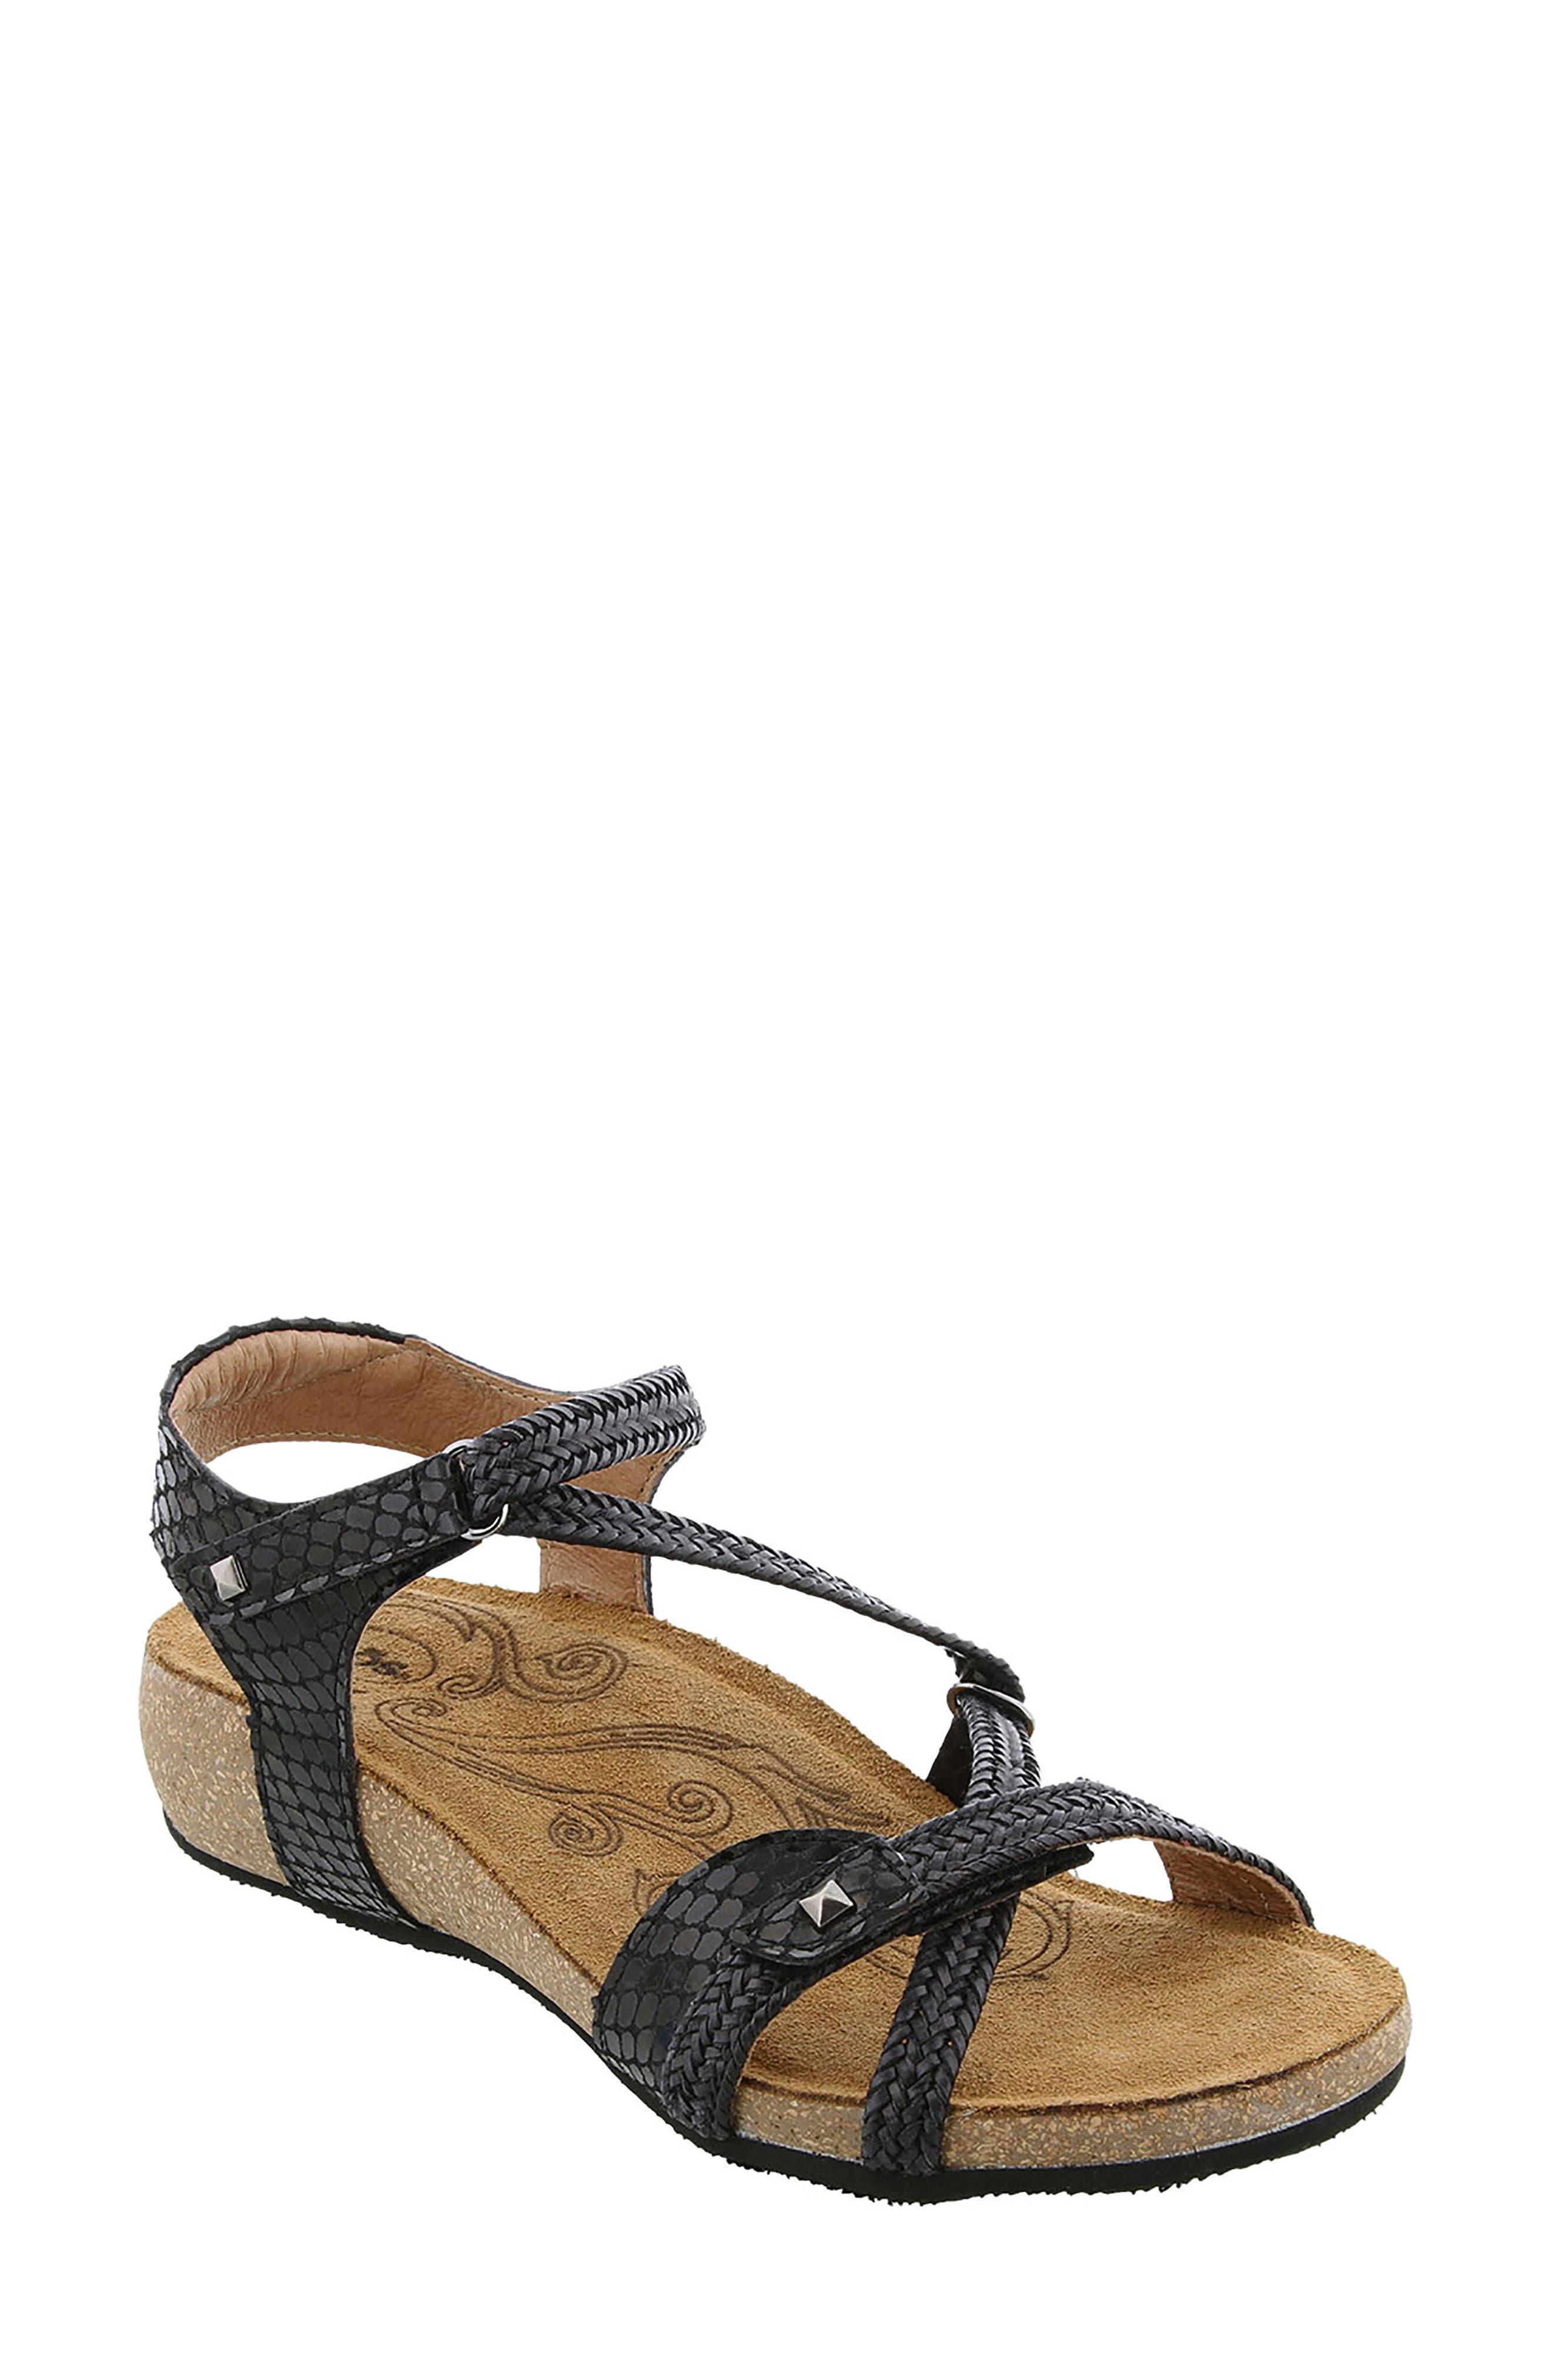 Ziggie Sandal,                         Main,                         color, 003